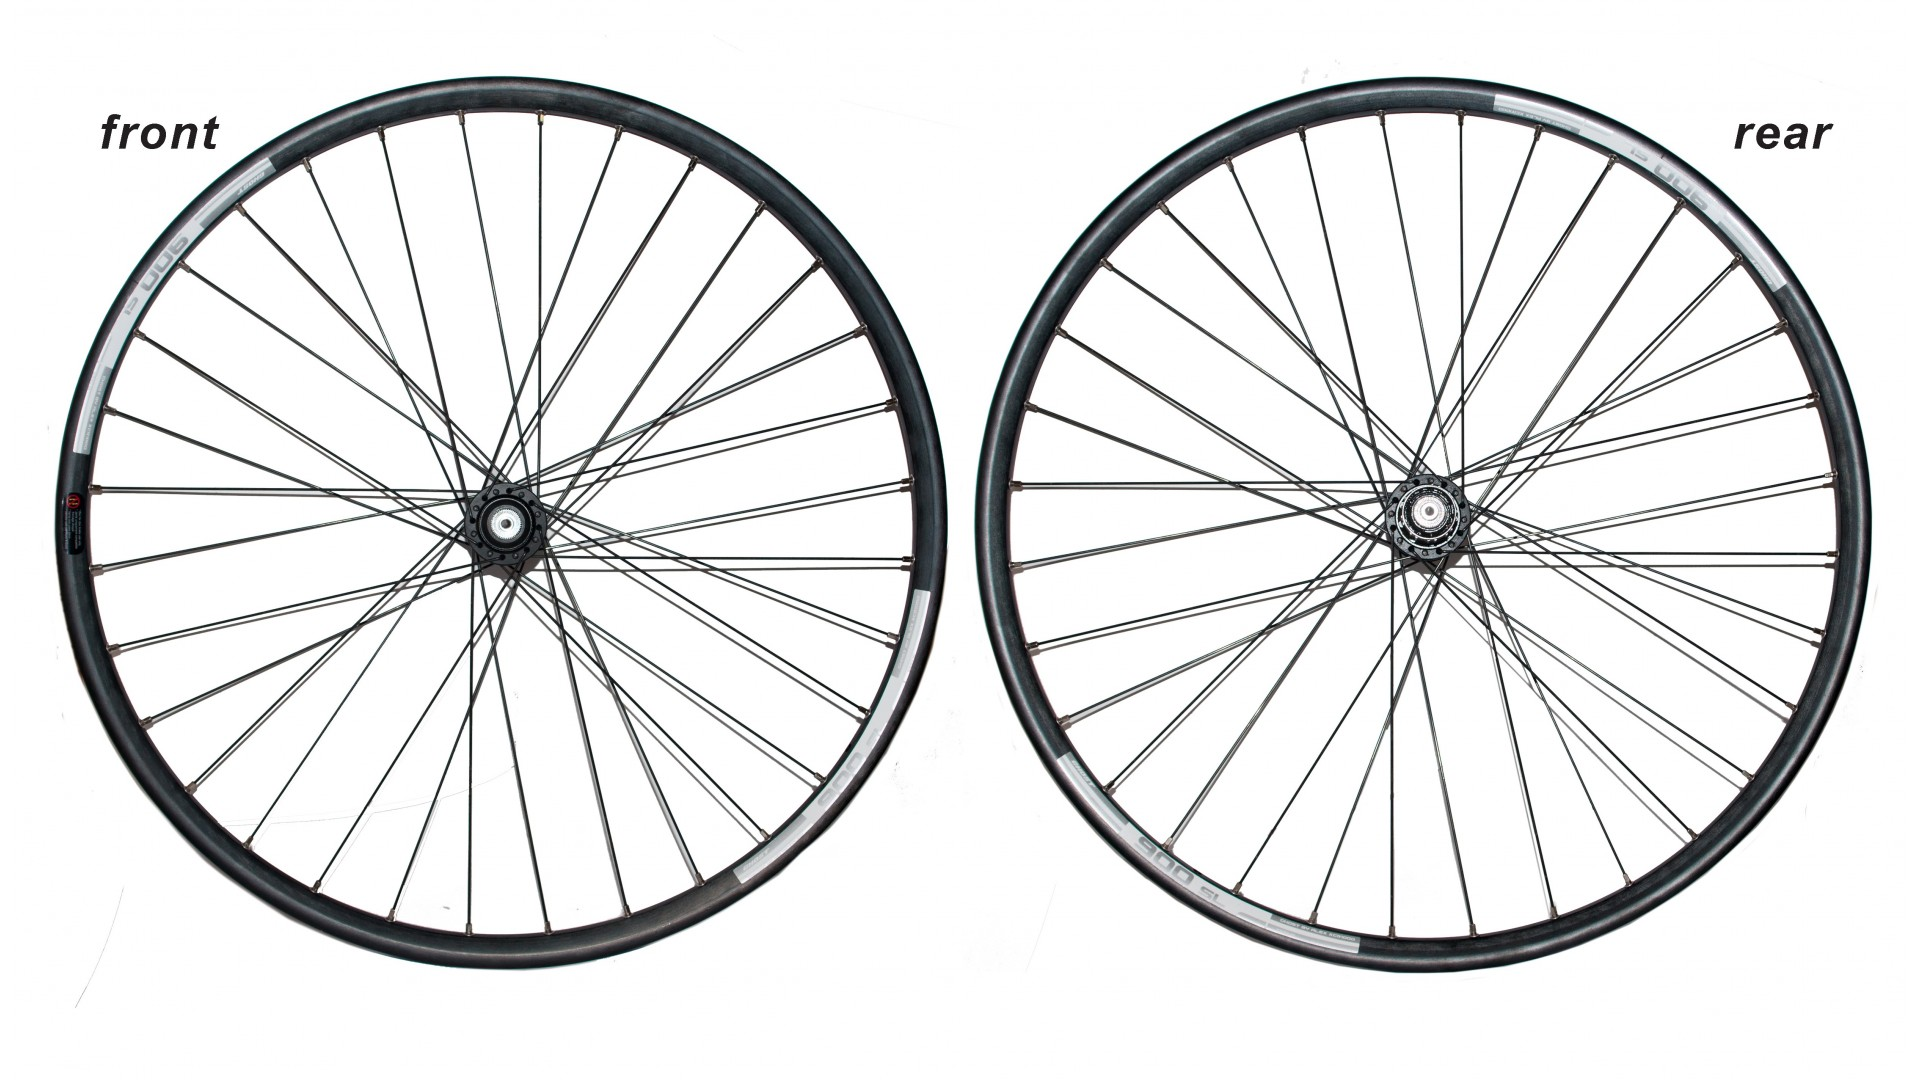 Комплект колес под диск ALEX 100D GHOST, Centerlock black 26